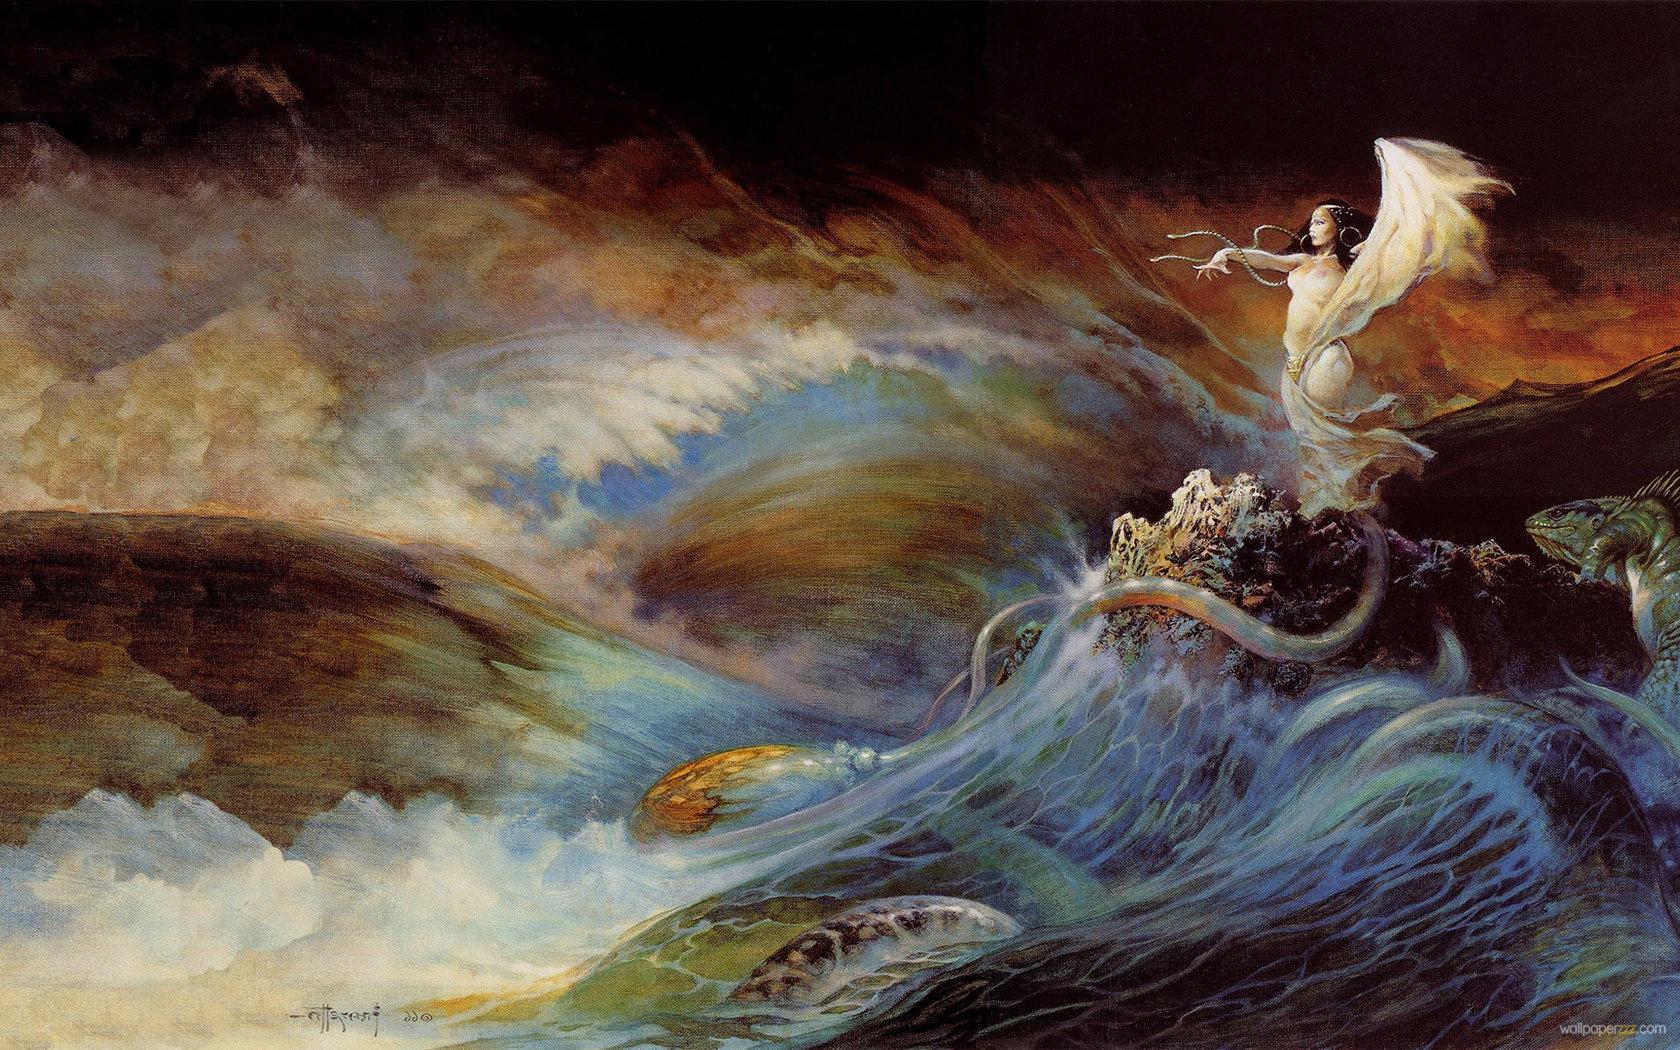 47] Frank Frazetta Fantasy Widescreen Wallpapers on WallpaperSafari 1680x1050